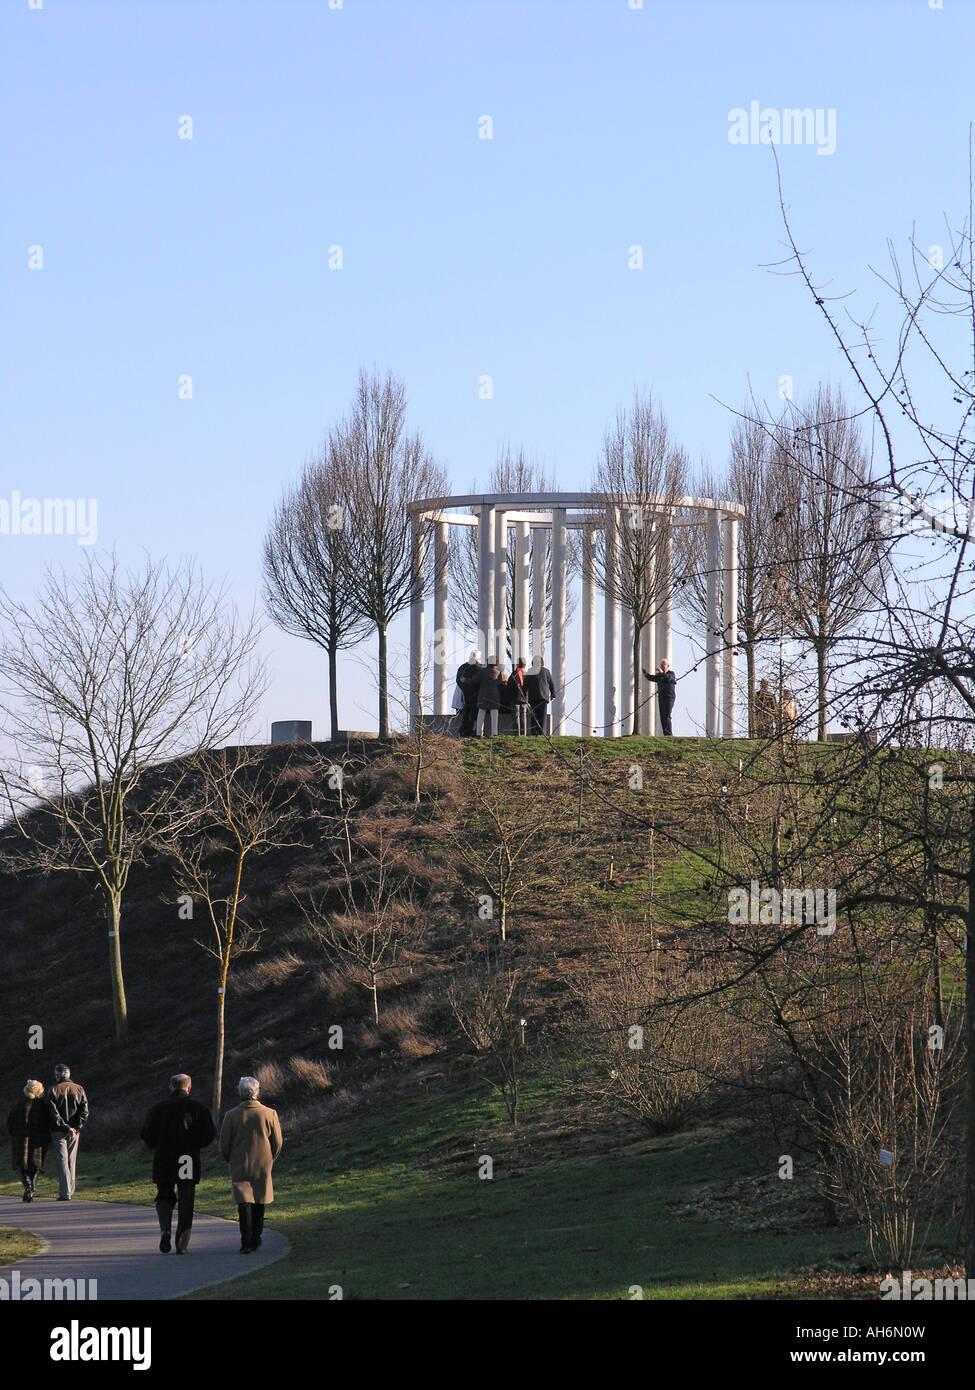 Rondell im Schlosspark Hohenheim Schloss Hohenheim Stuttgart Deutschland Stock Photo